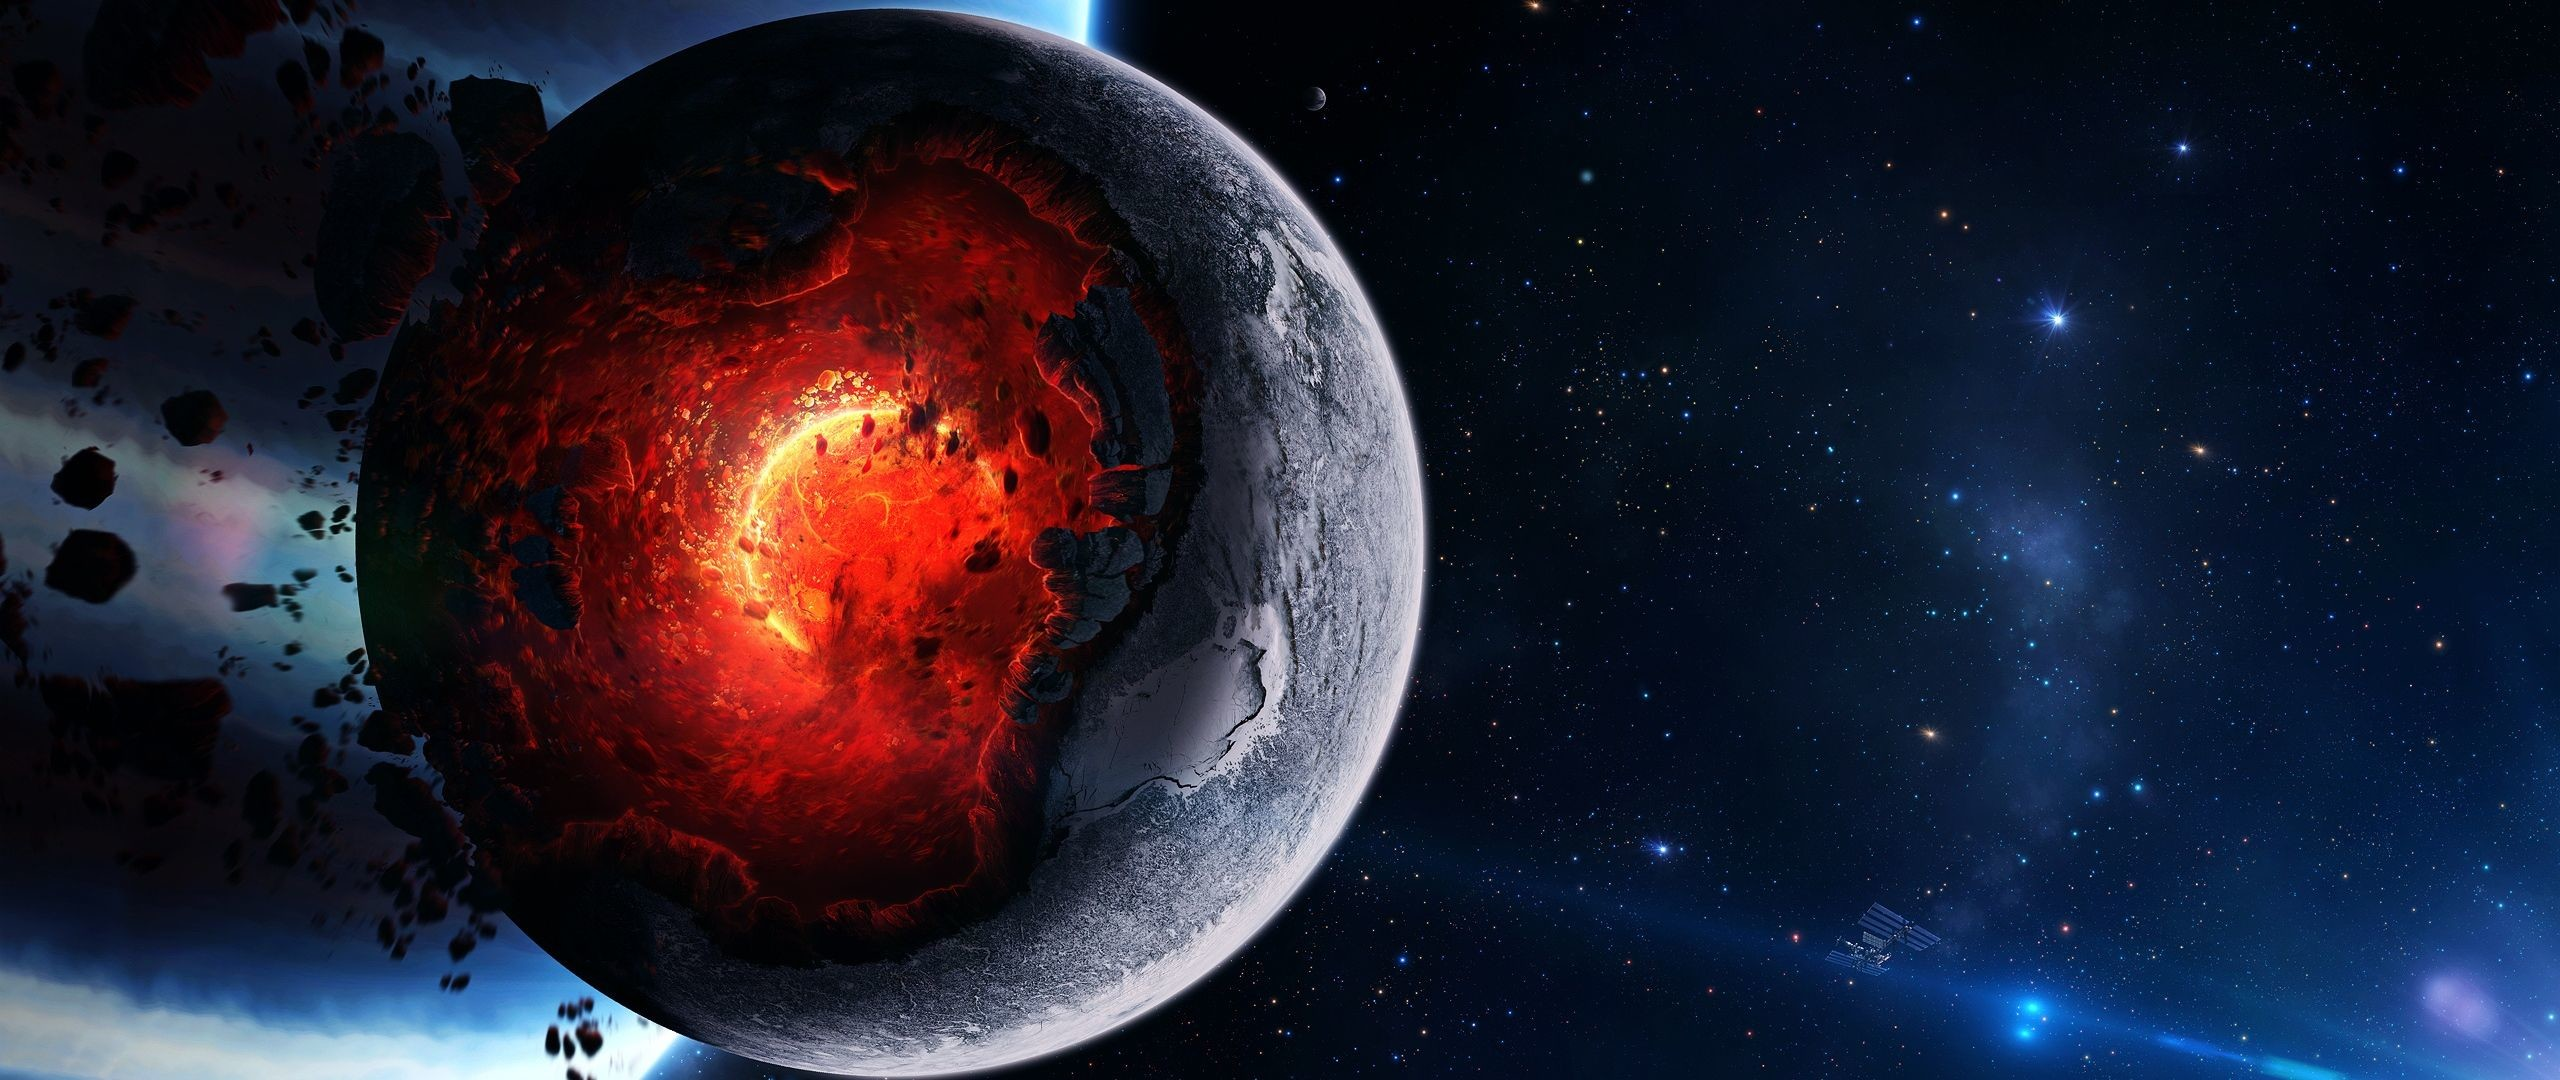 Res: 2560x1080, Download Wallpaper  Space, Cataclysm, Planet, Art, Explosion,  Asteroids, Comets